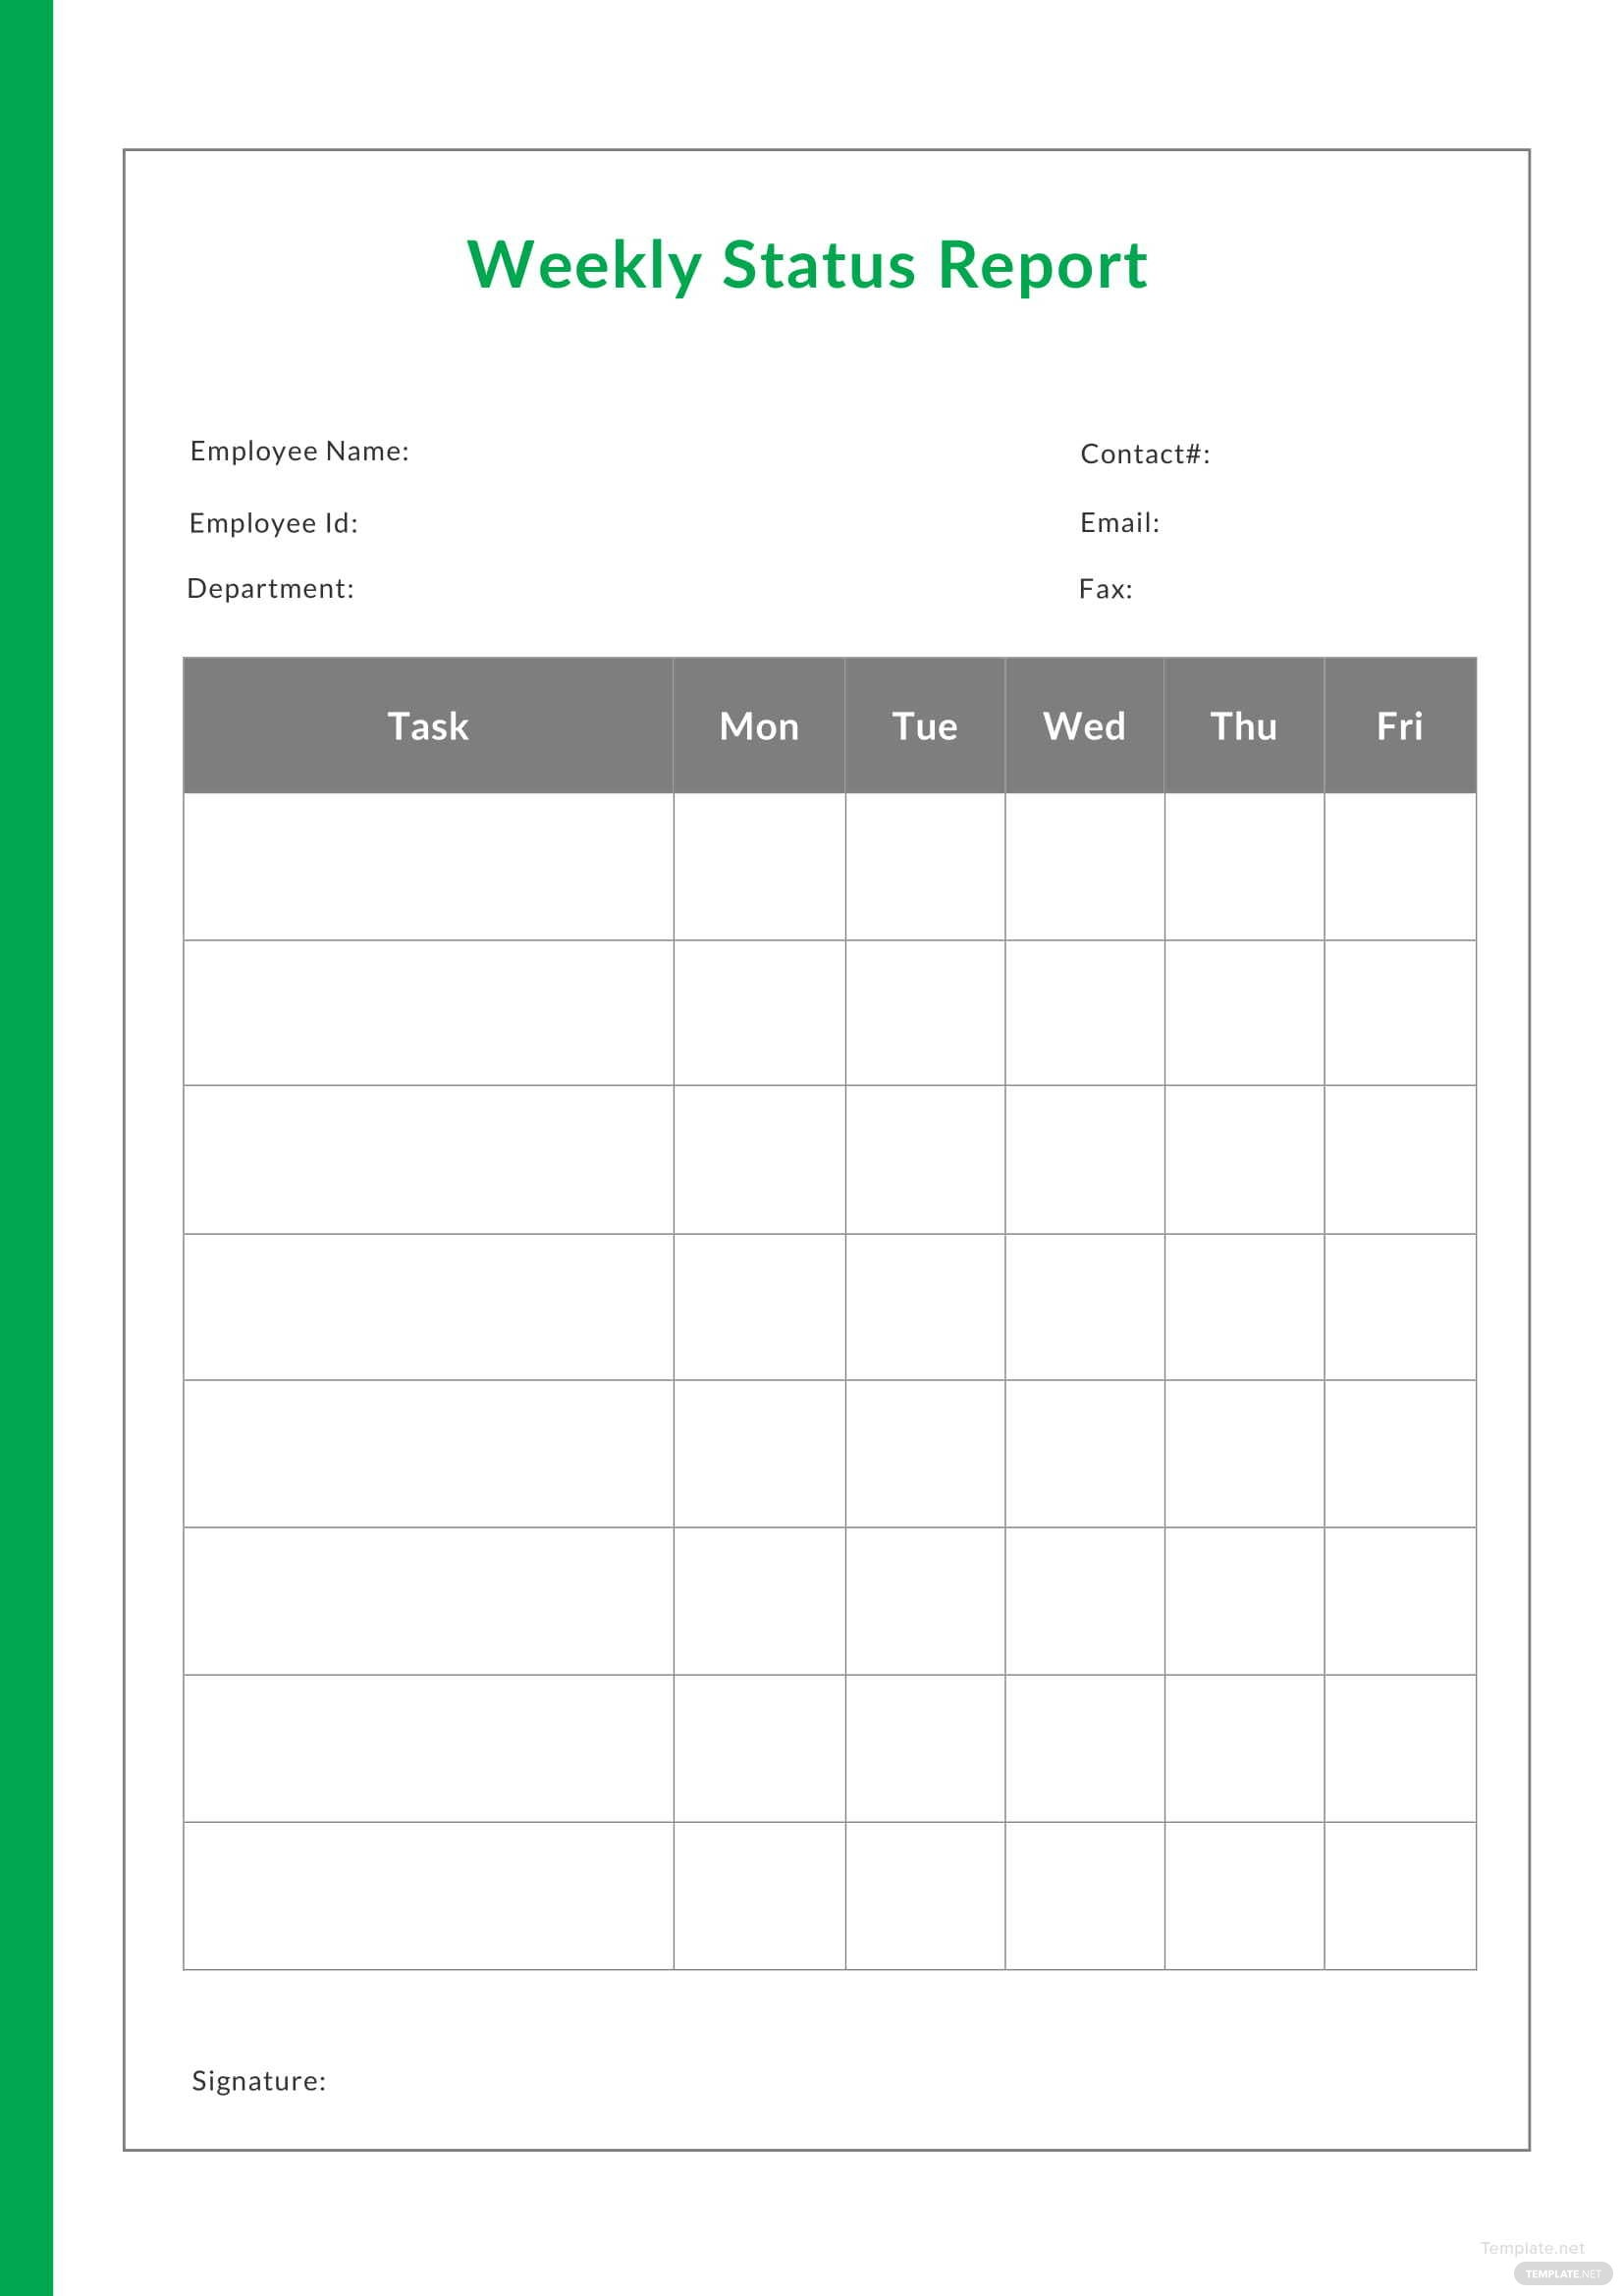 sample weekly status report template in microsoft word